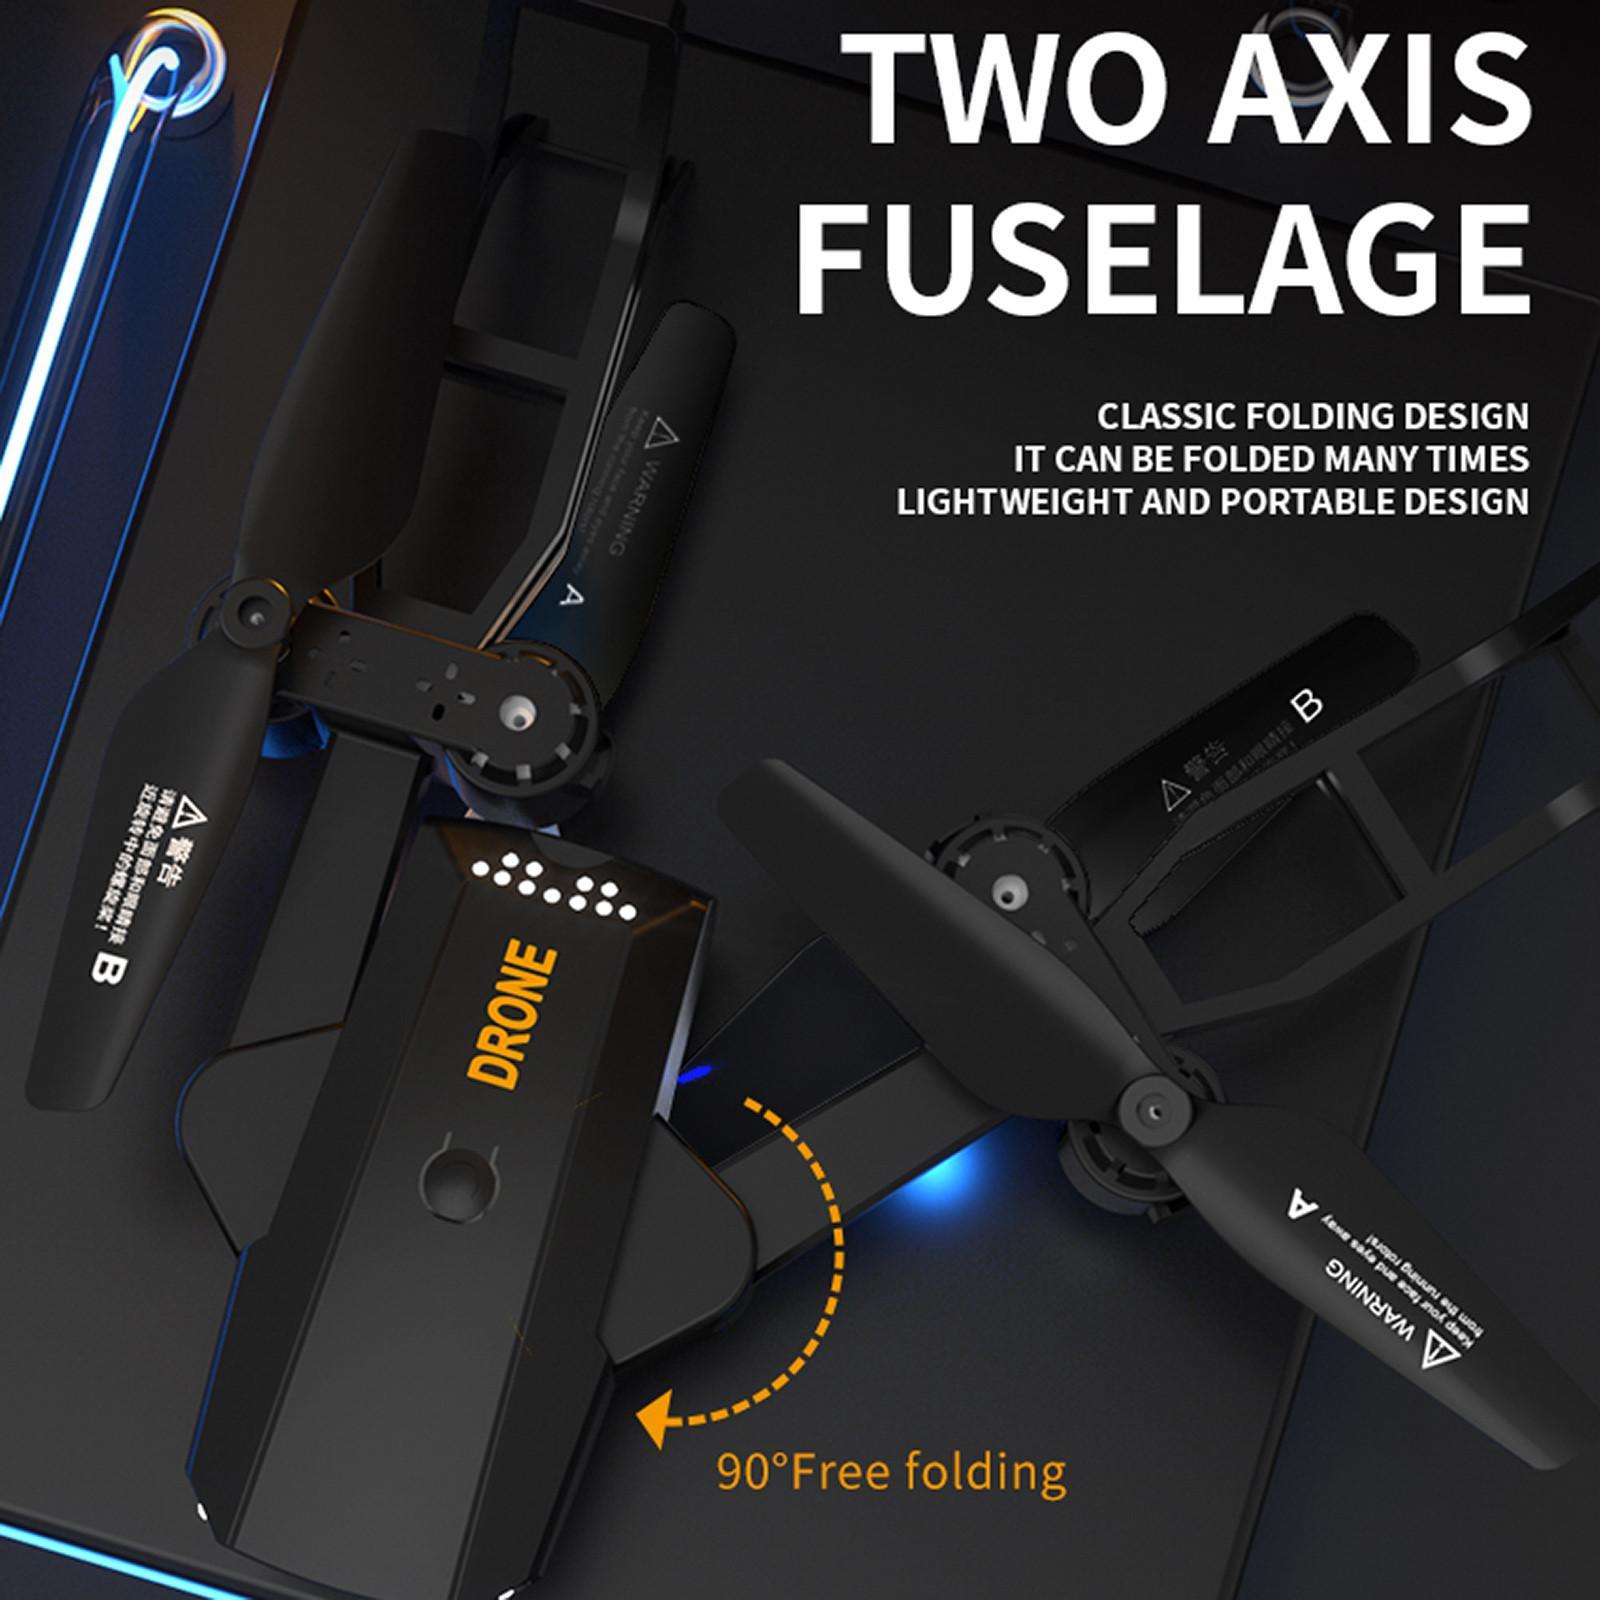 A9 UAV Drone 30W Dual Camera HD широкоугольный Wi-Fi Drone высота Дрон Дронс вертолет